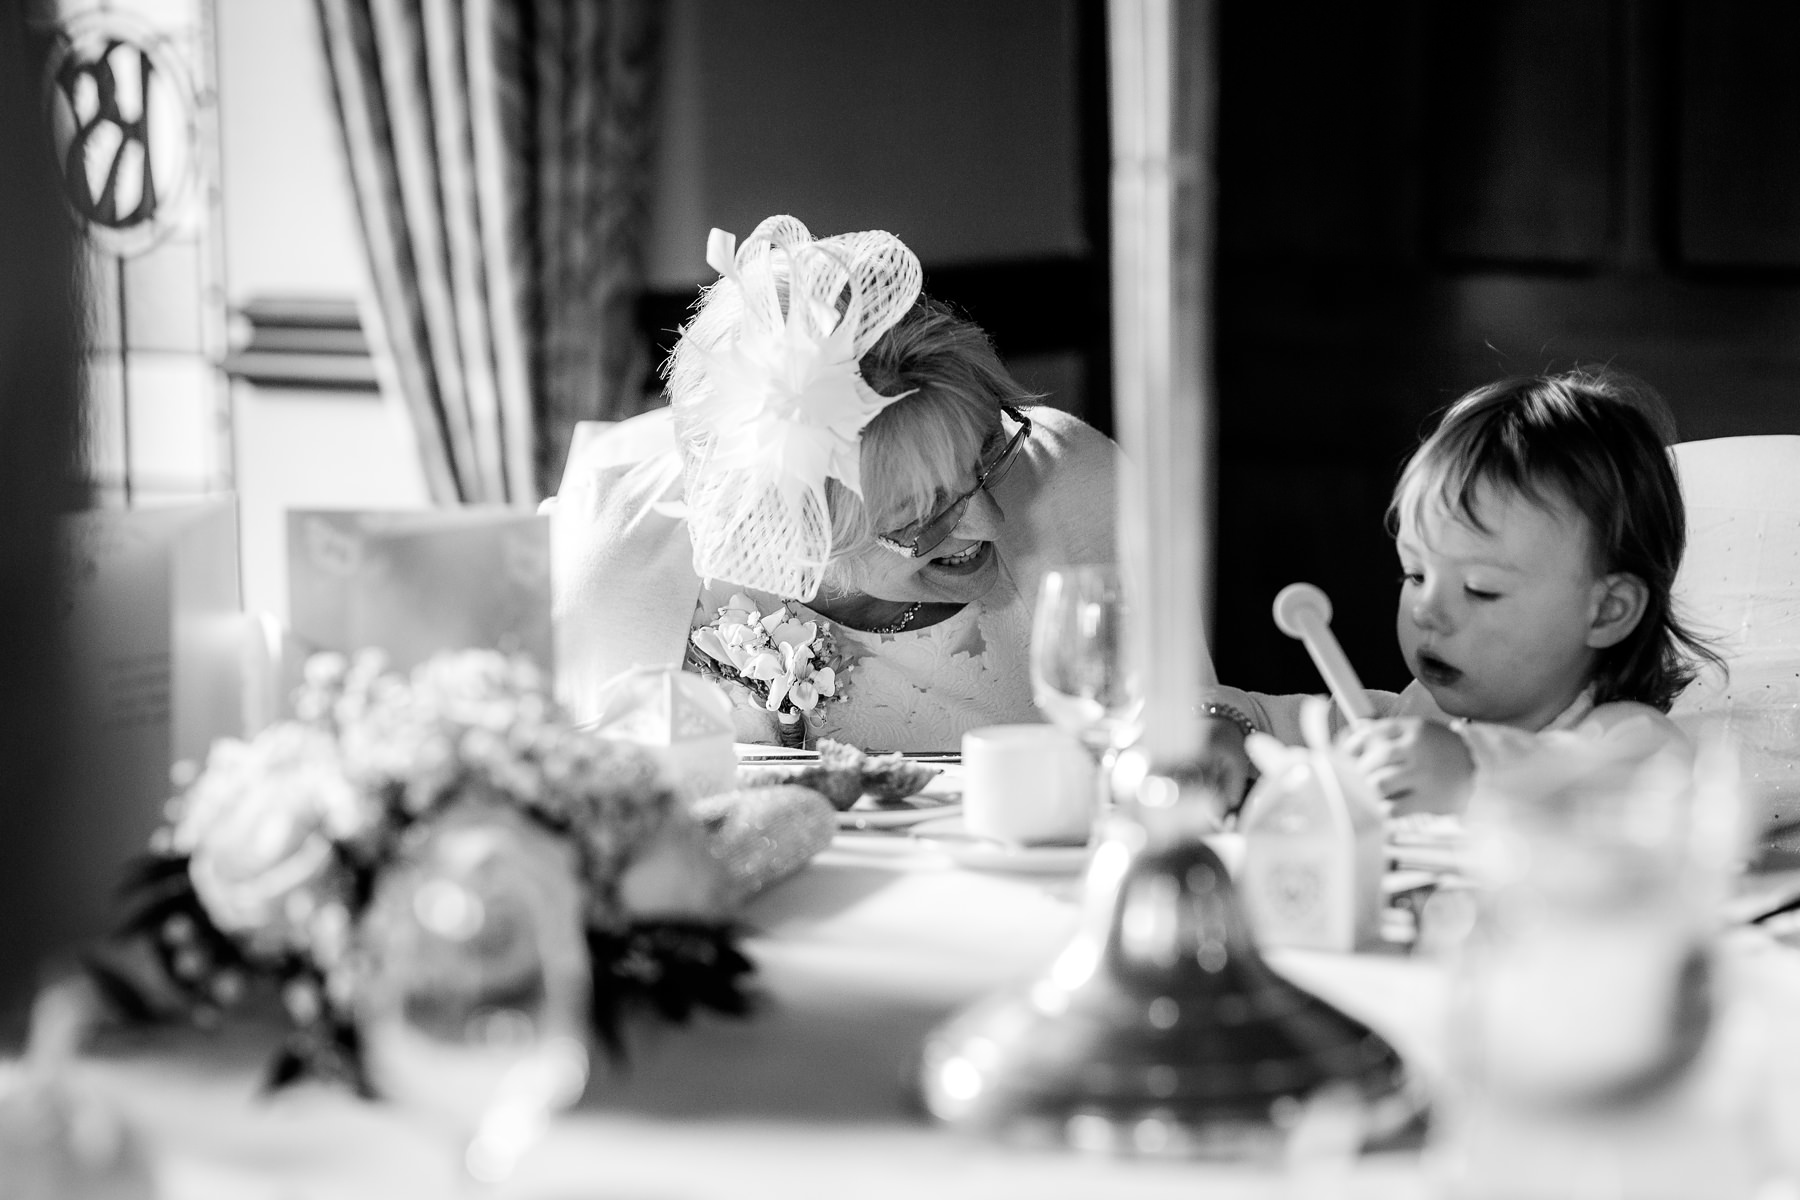 intimate-wedding-at-kilhey-court-lancashire-photographer_0029.jpg